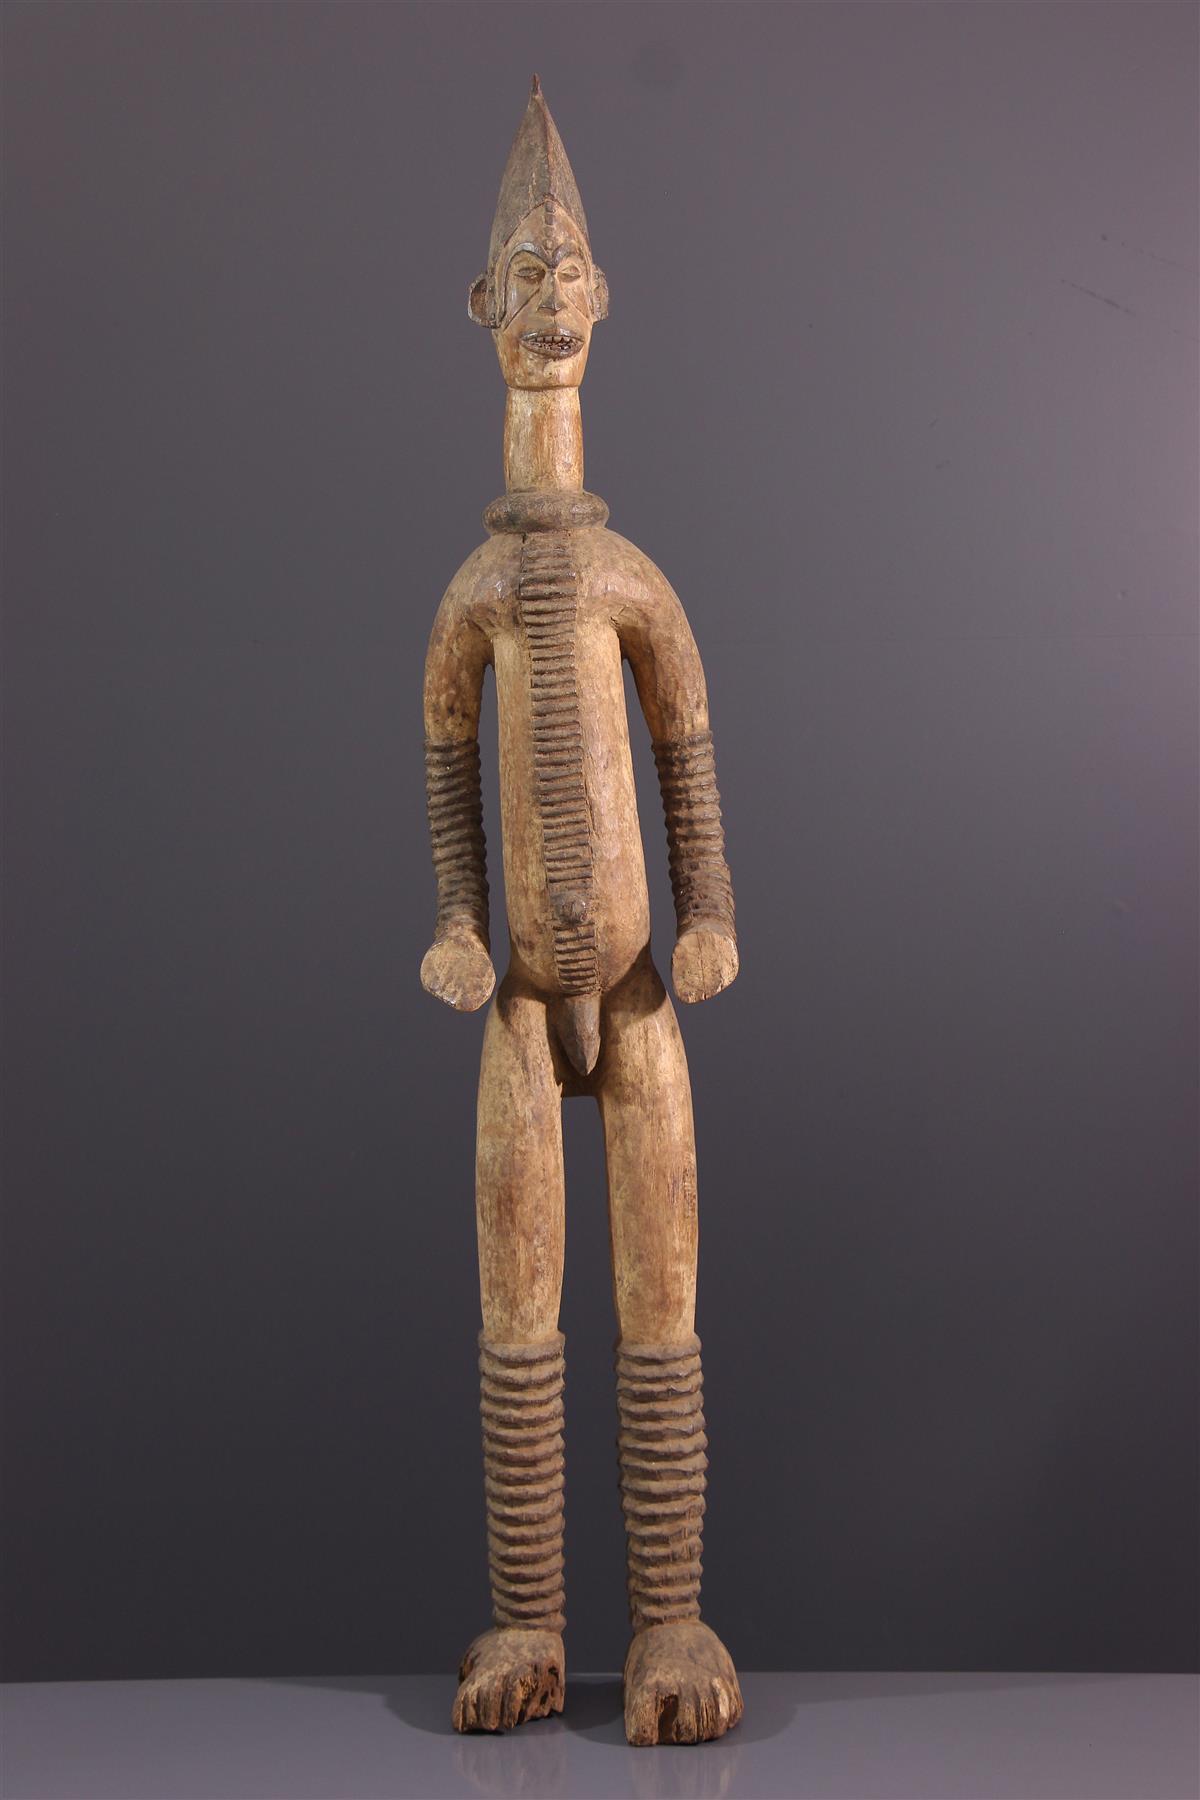 Statue Igbo - African art